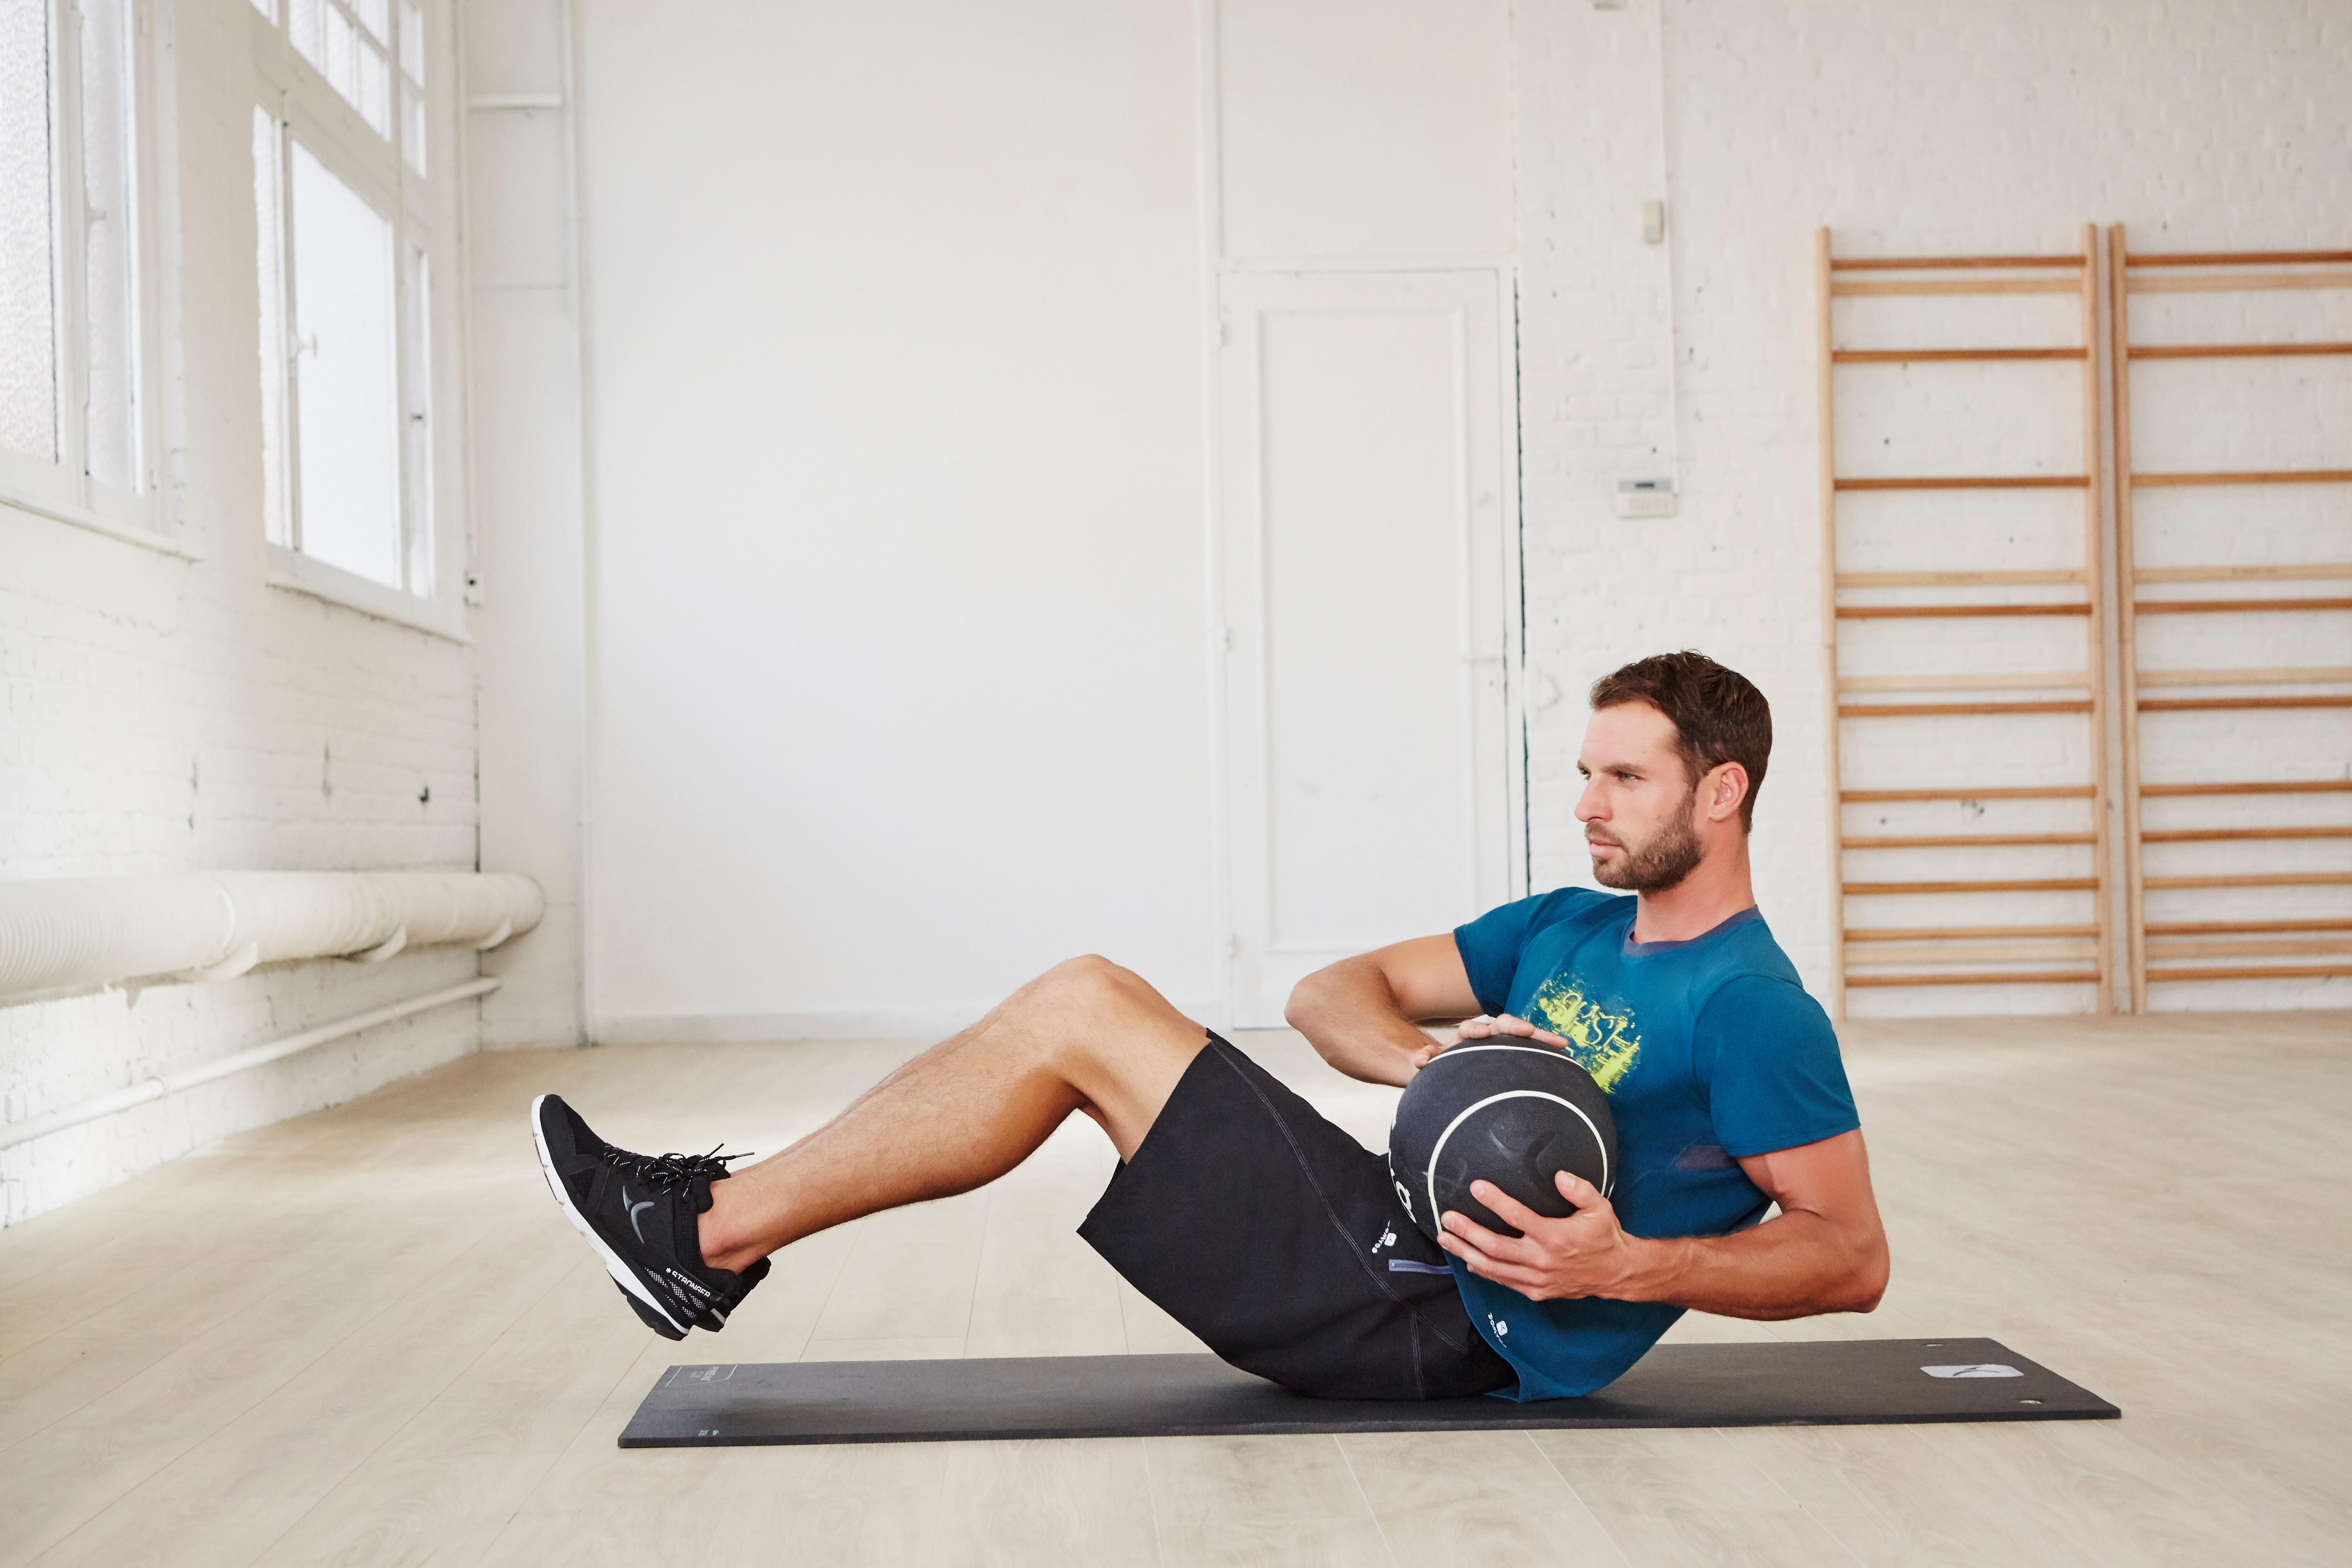 Energy Fitness and Cardio Shorts - Dark Grey